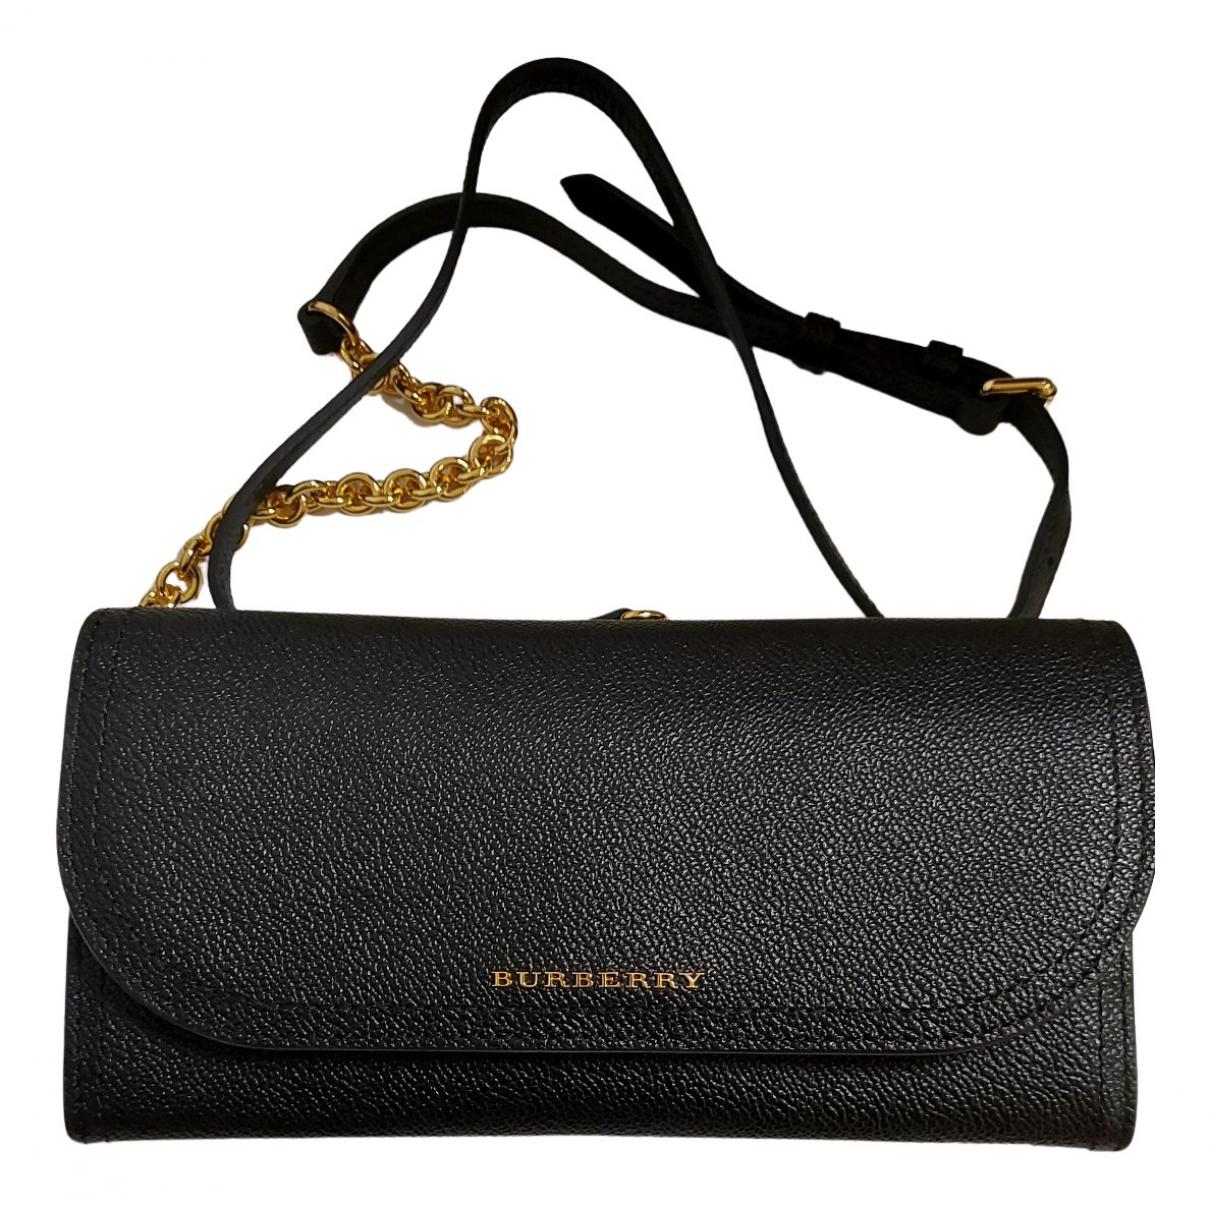 Burberry N Black Leather Clutch bag for Women N